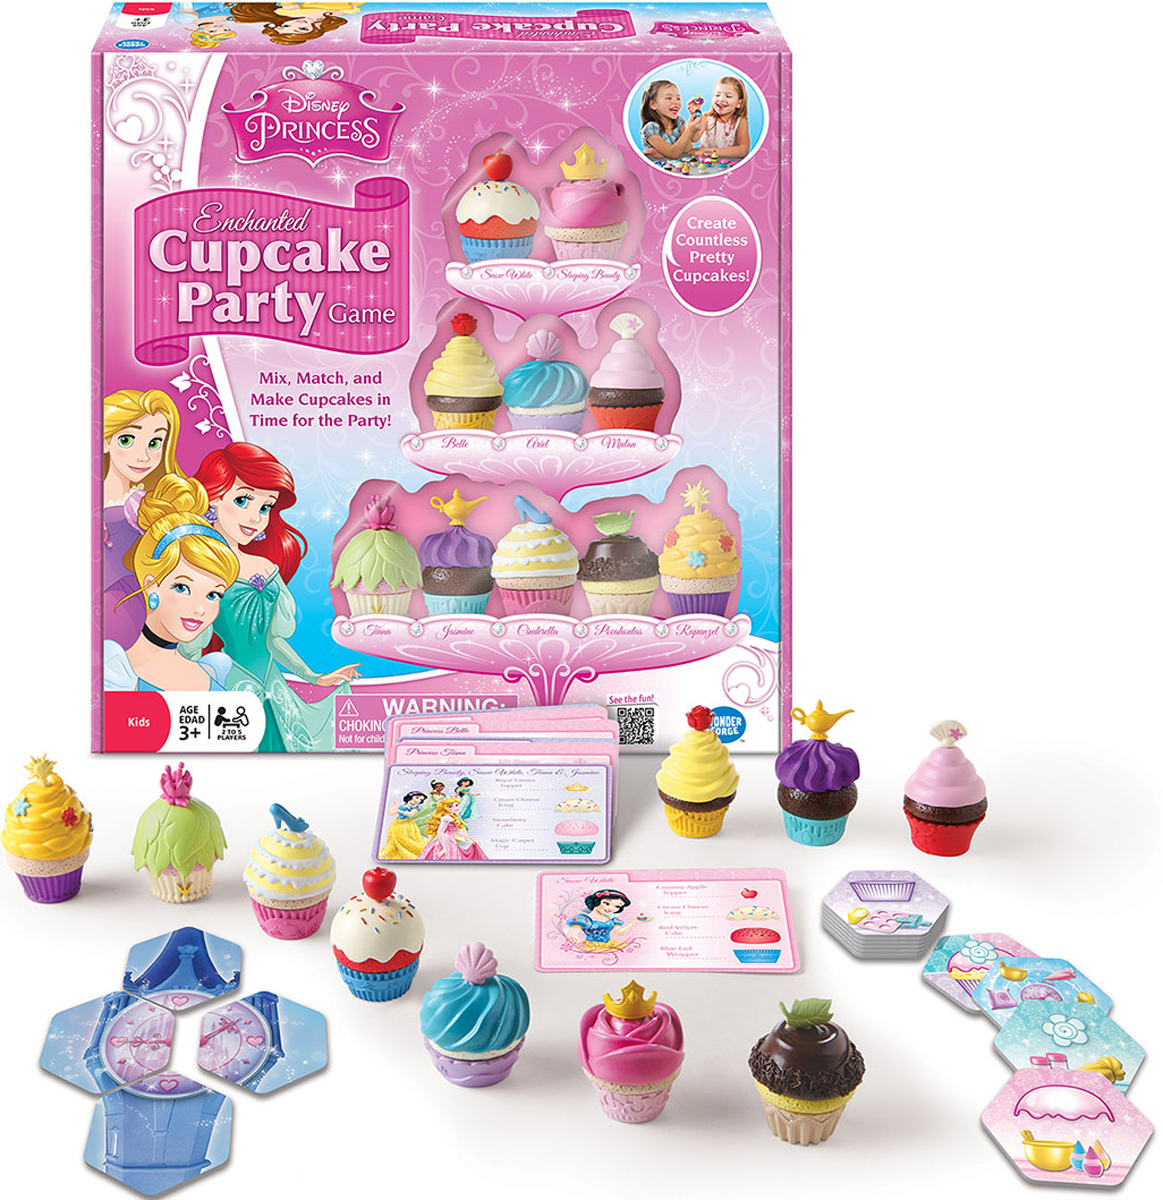 Disney Princess Enchanted Cupcake Party™ Game